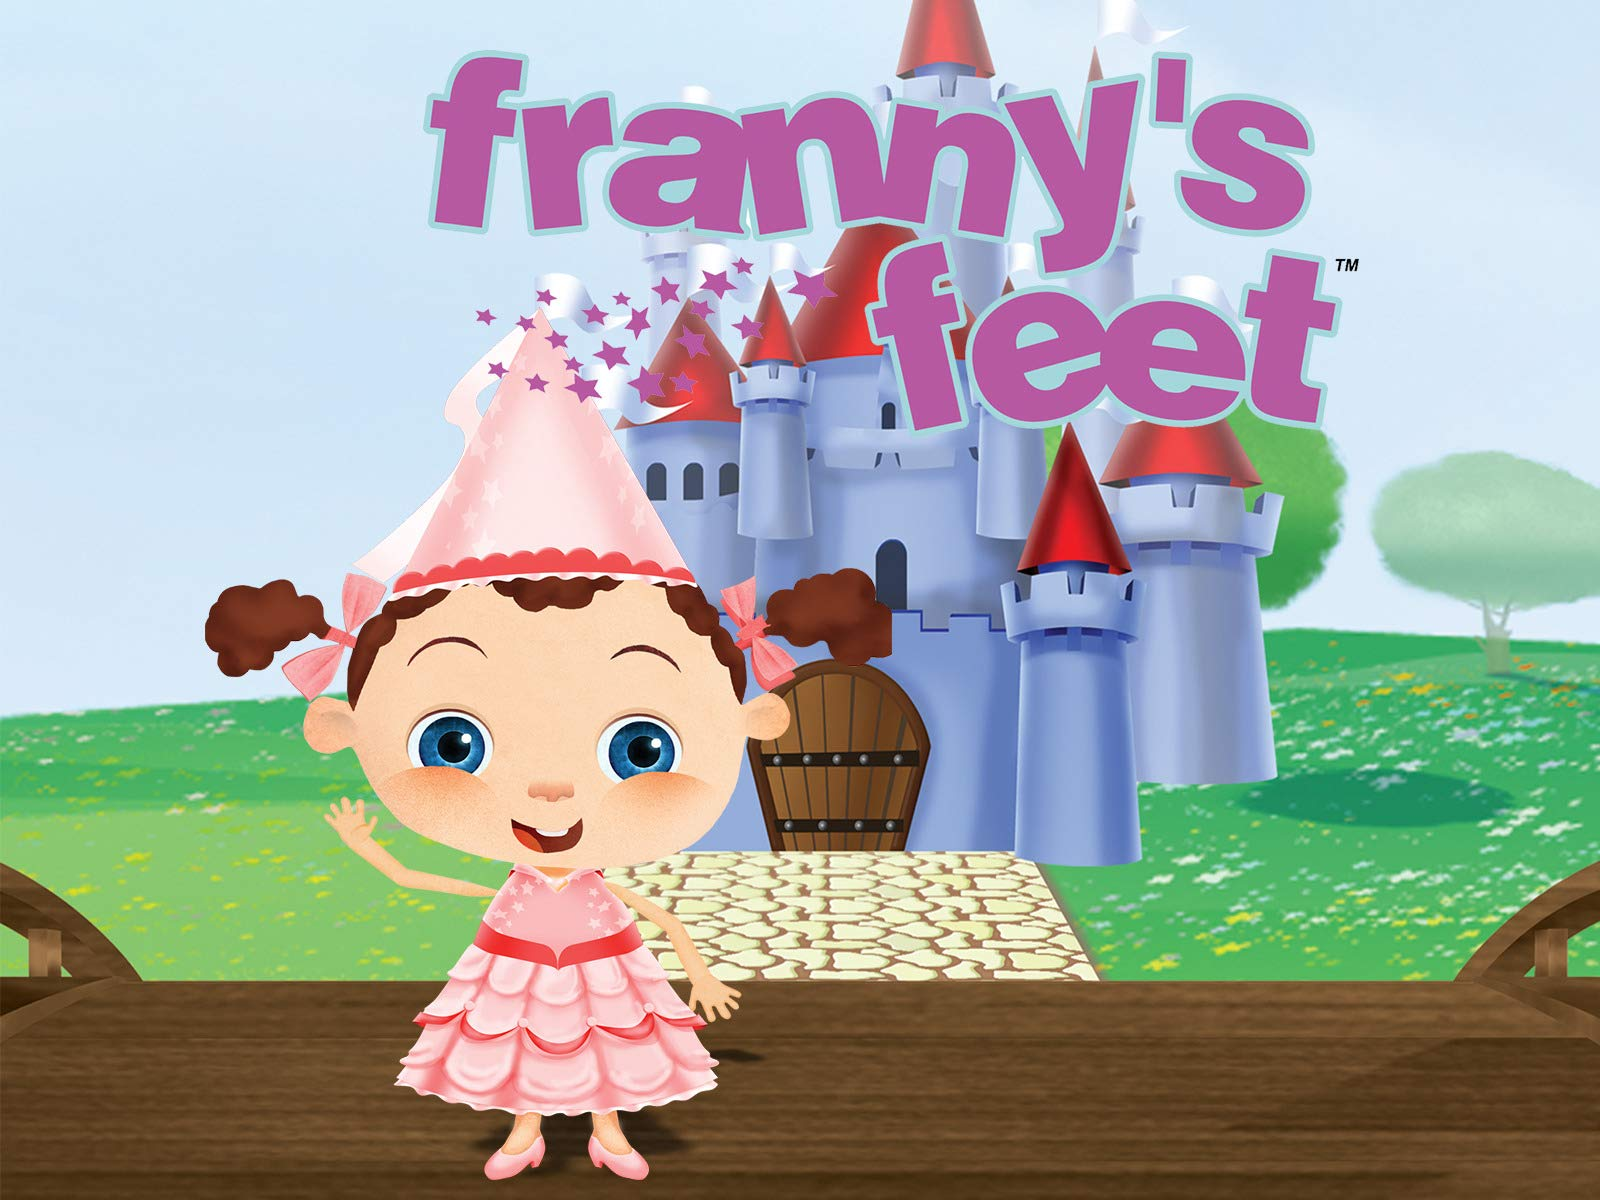 Franny's Feet - Season 2